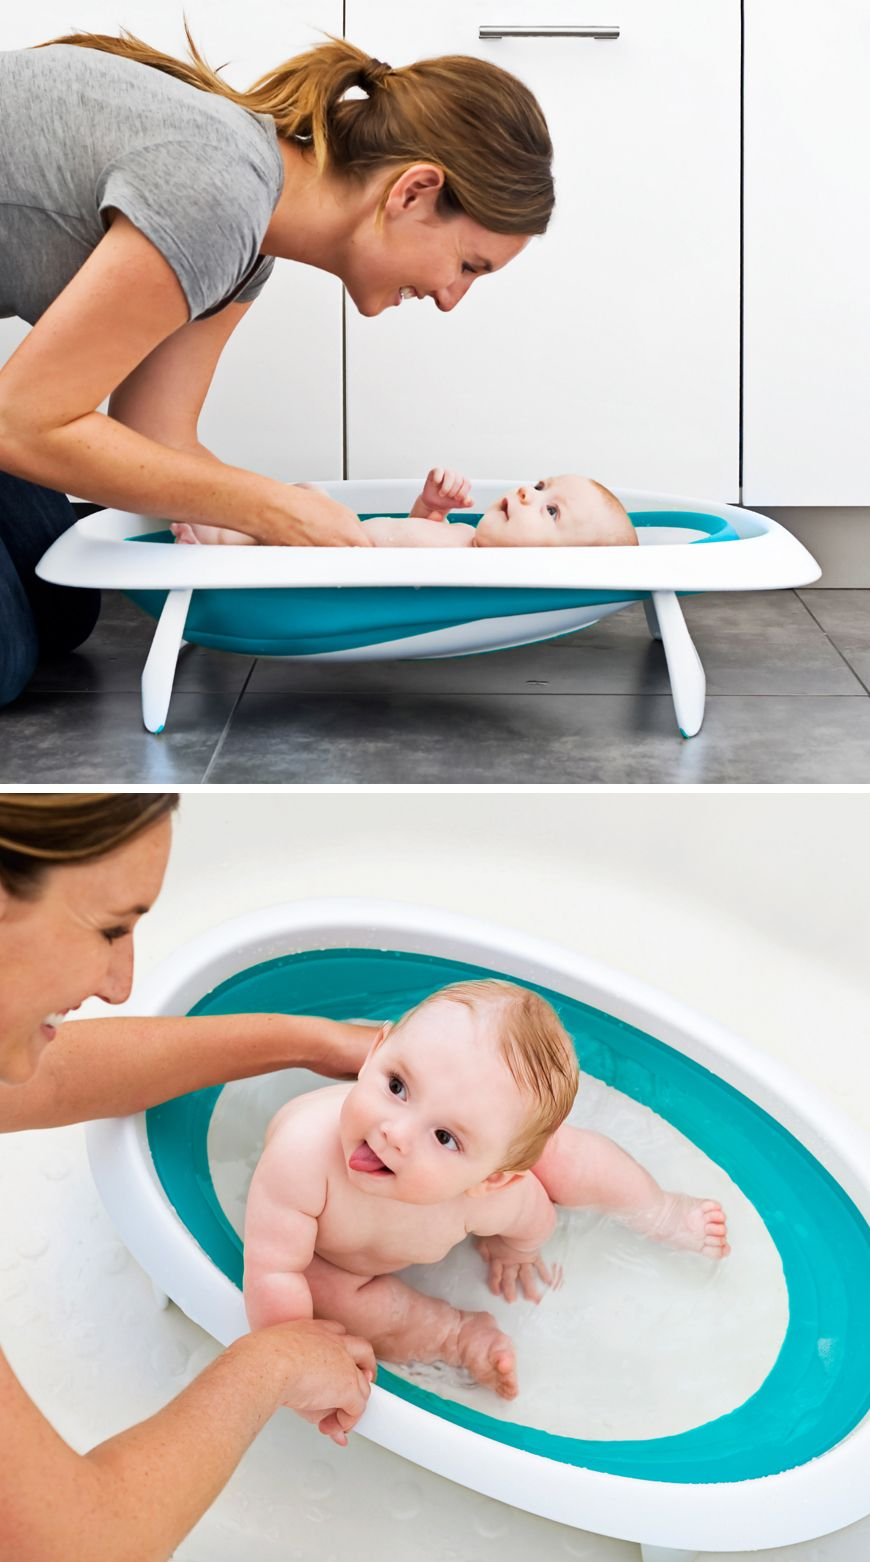 Fantastic Tub Paint Small Paint Bathtub Square Paint For Bathtub Bathtub Refinishers Old Bath Refinishing Service Purple Paint For Tubs